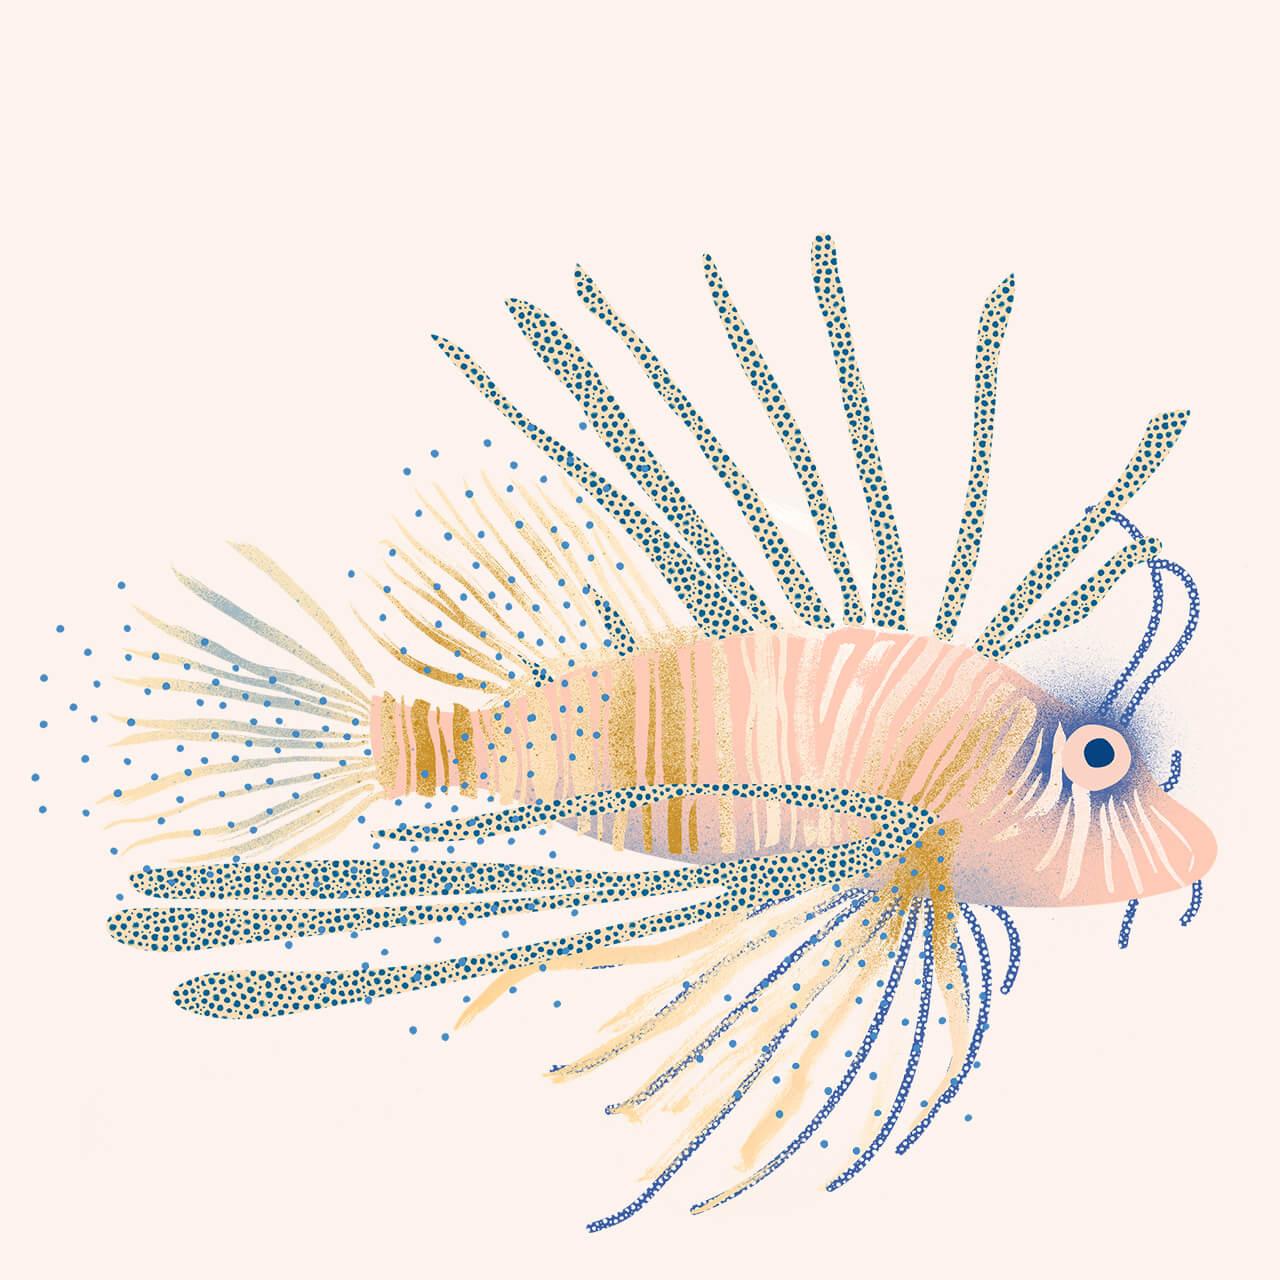 Lionfishie